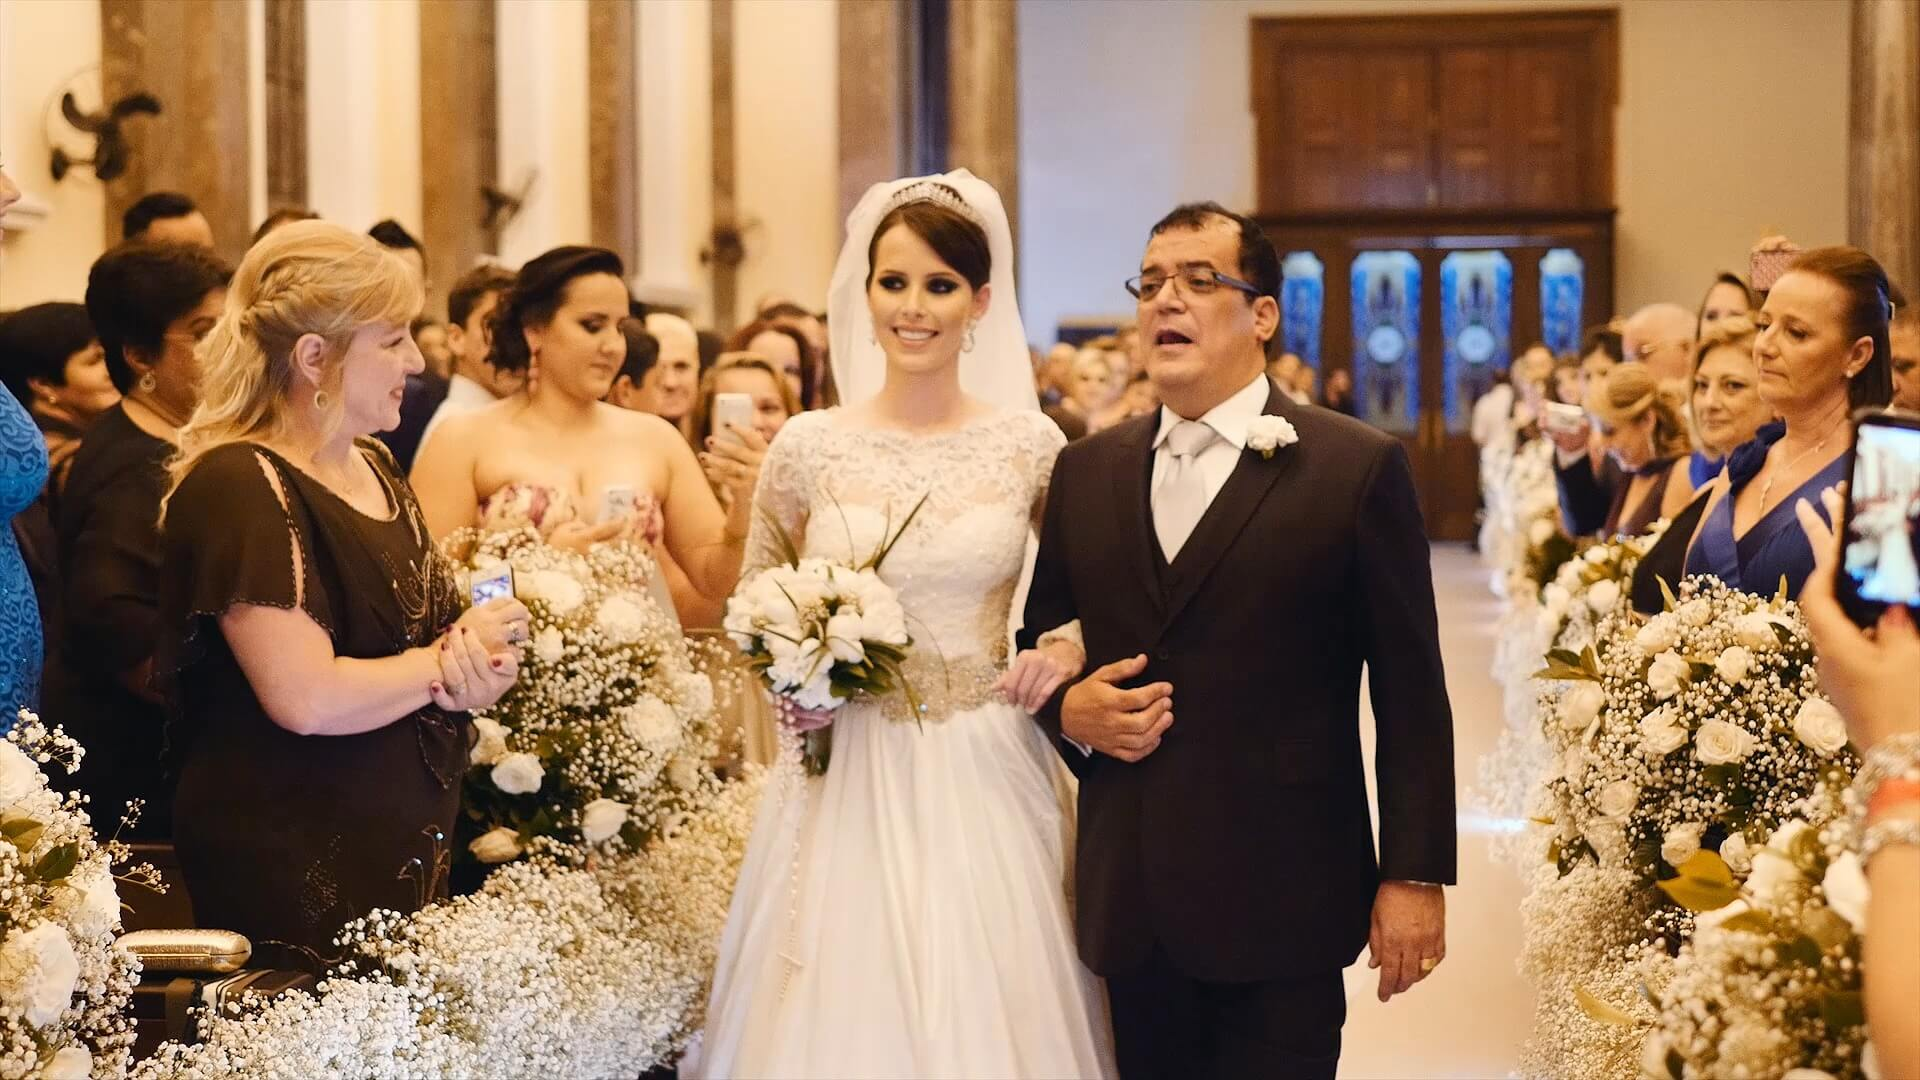 casamento_igreja_sao_luis_gonzaga